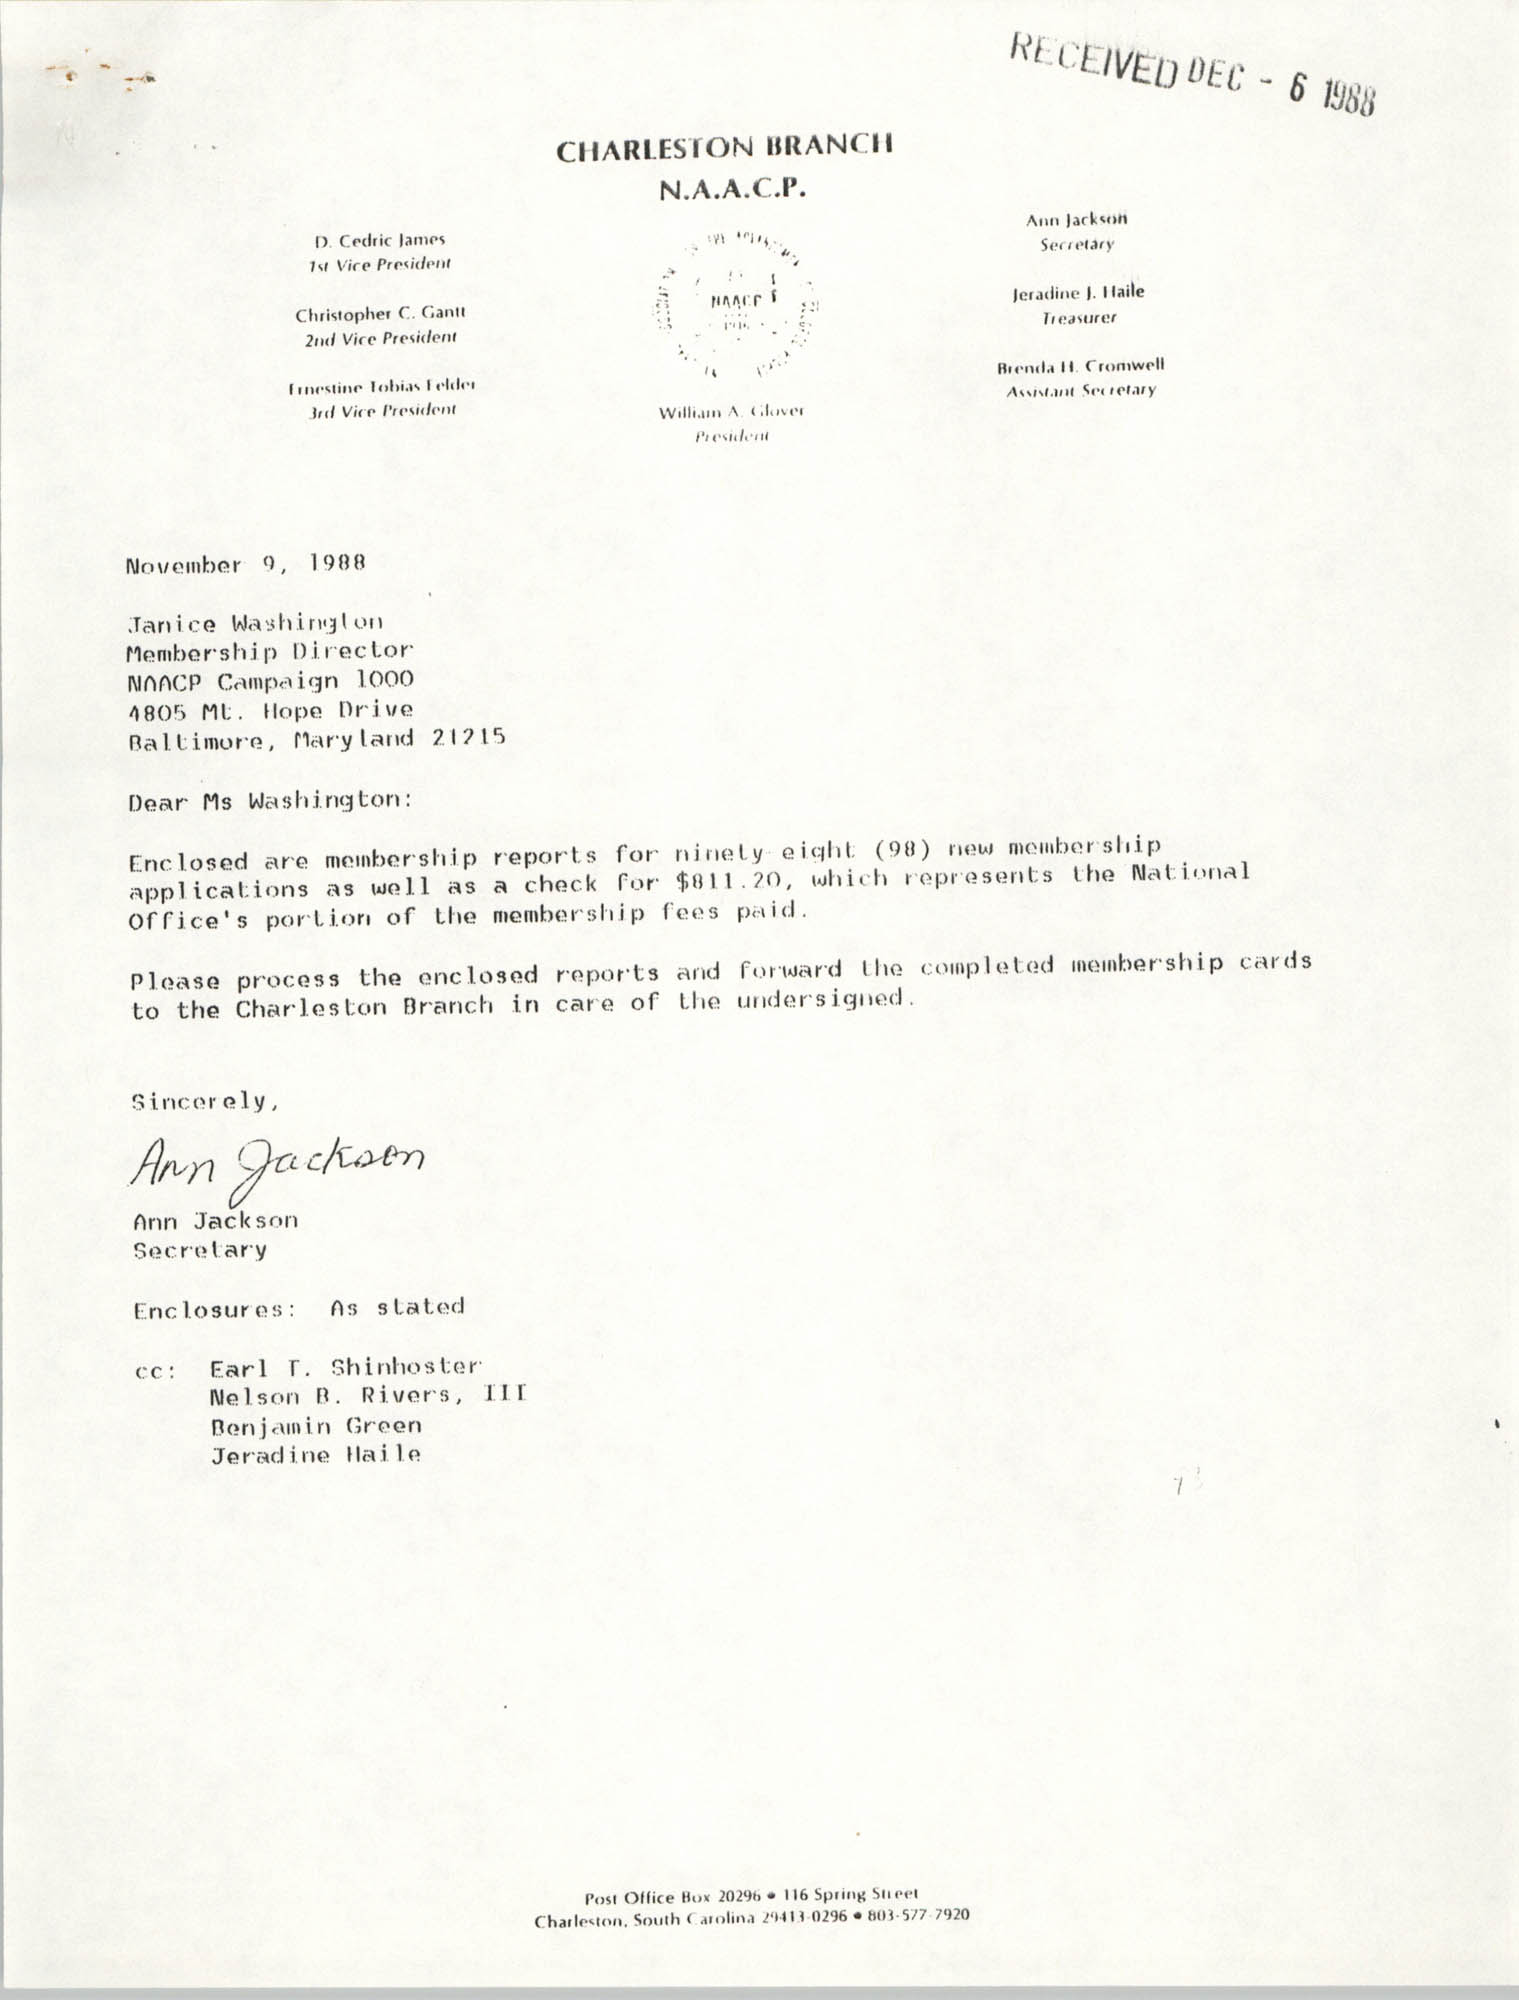 Letter from Ann Jackson to Janice Washington, NAACP, November 9, 1988